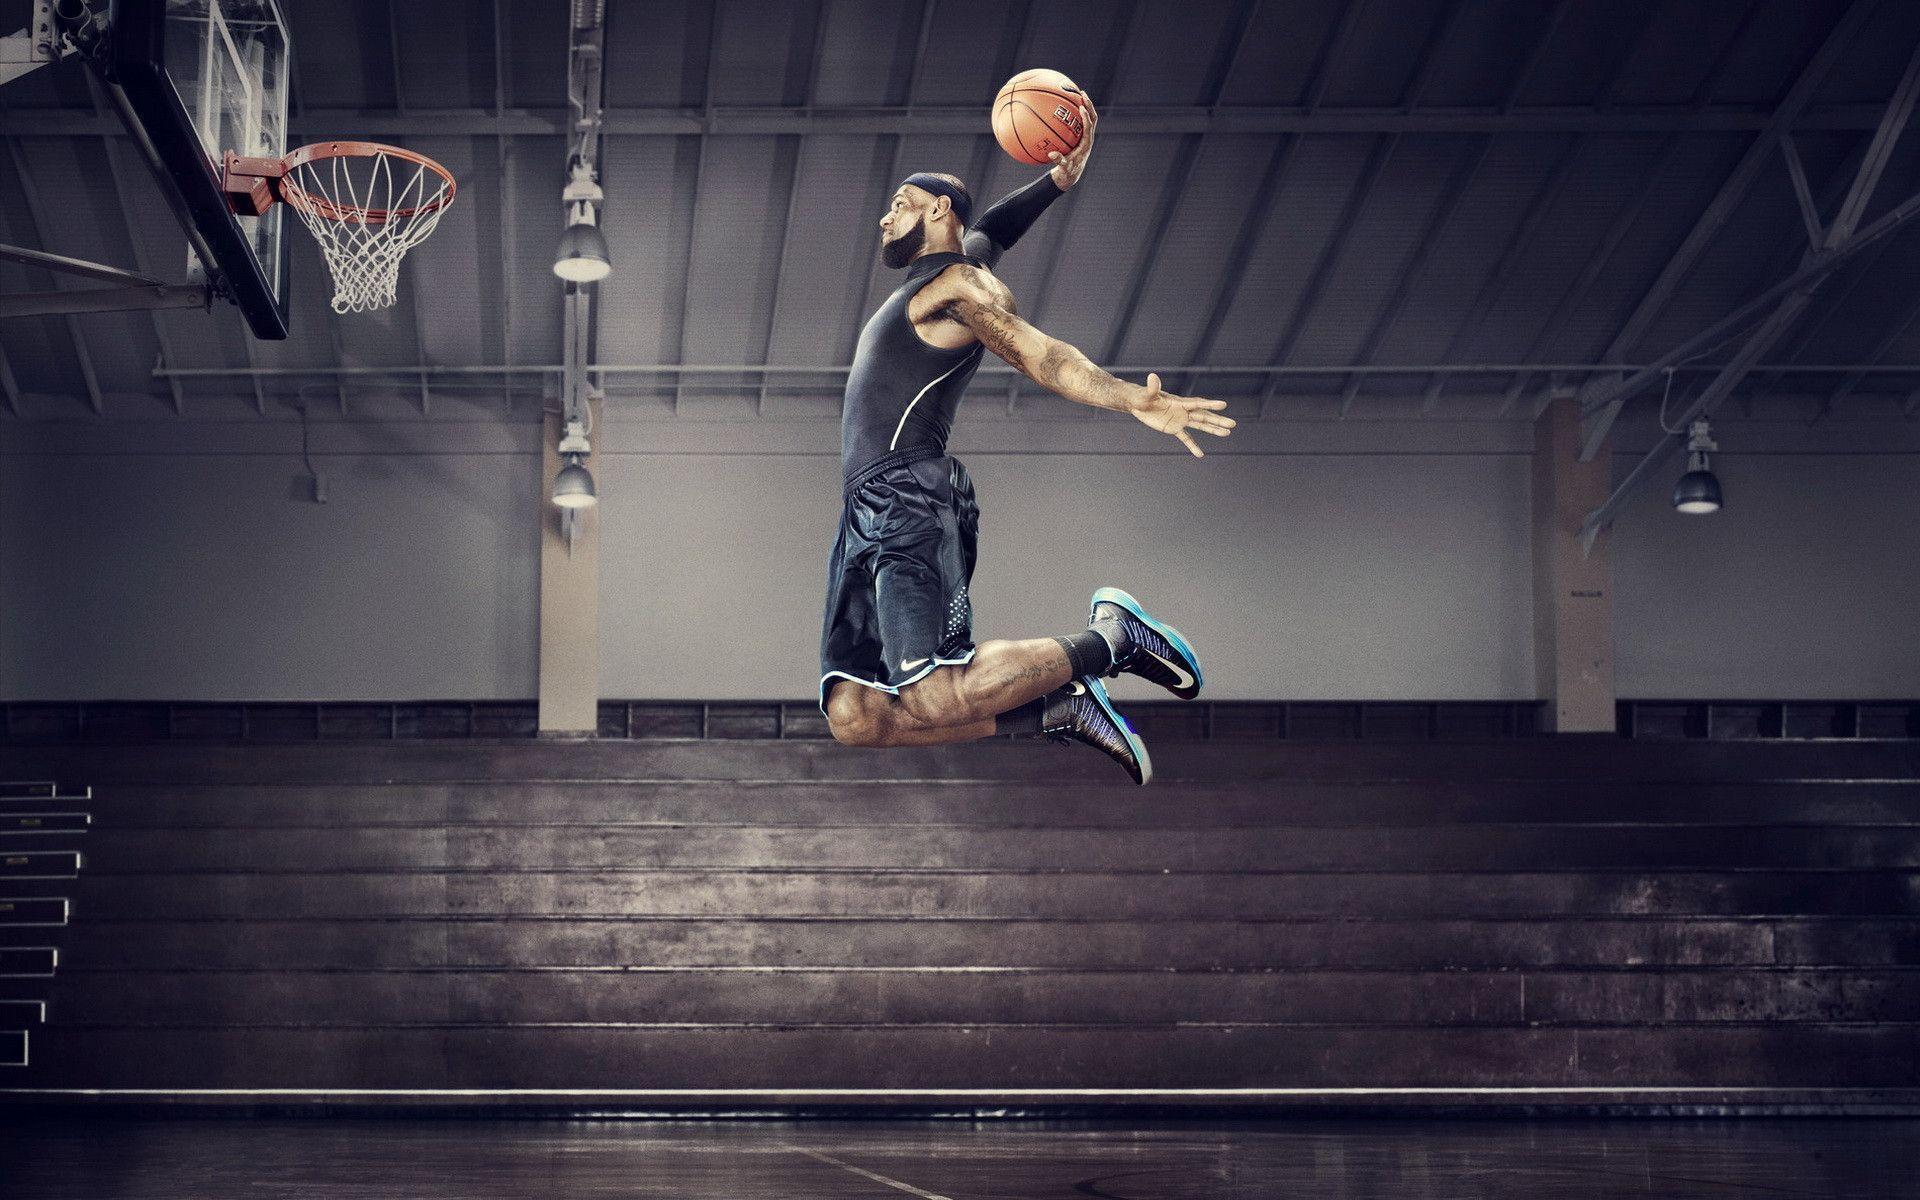 nike college basketball wallpaper - photo #16